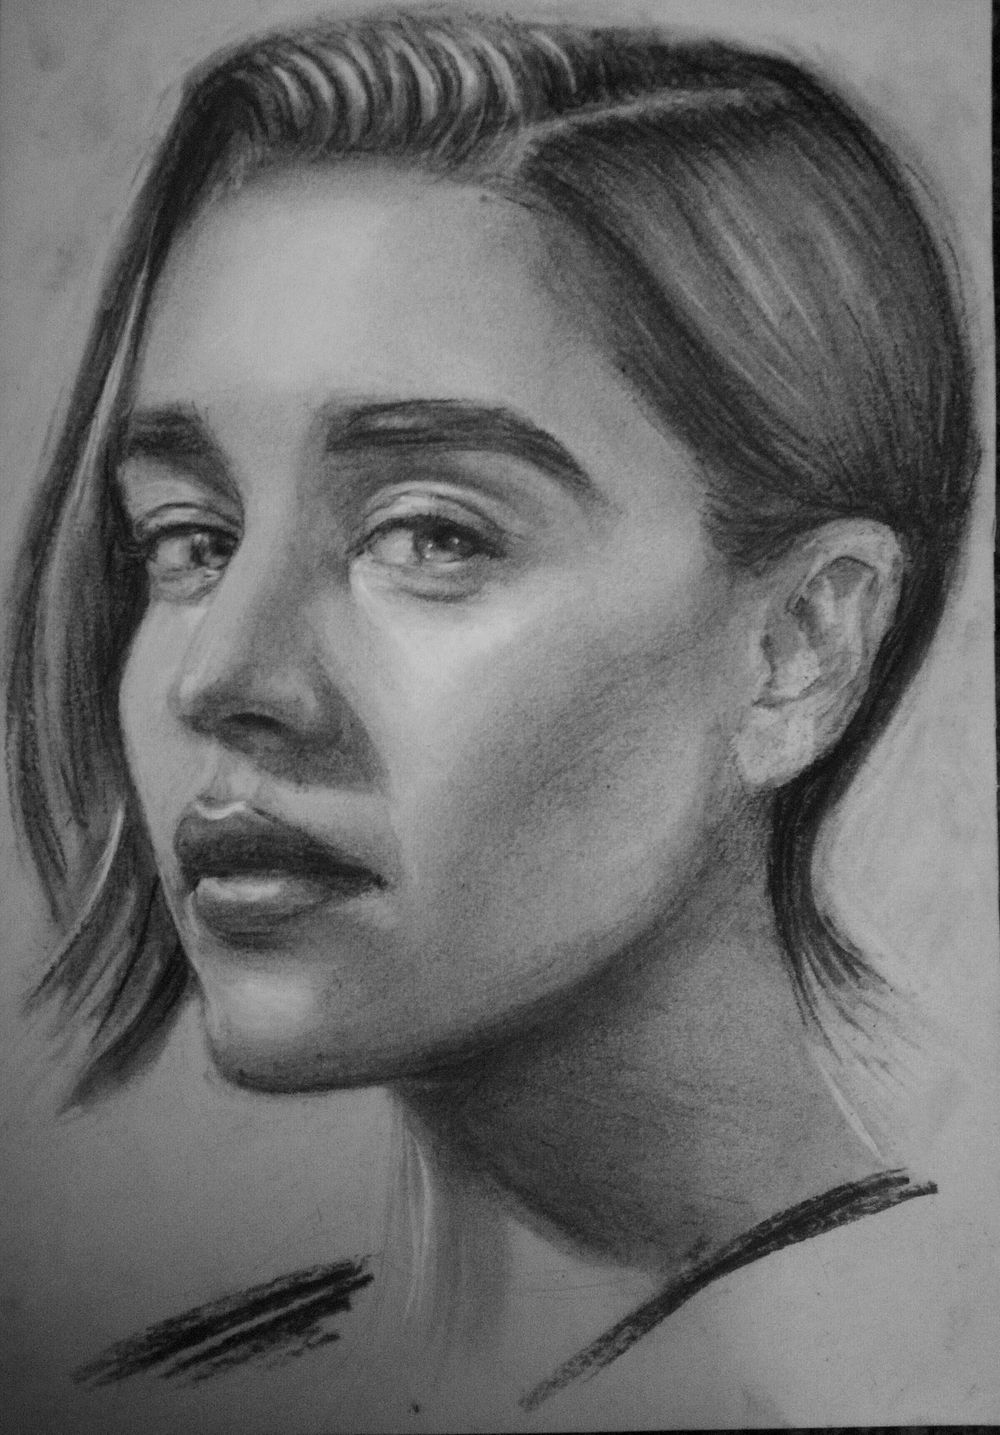 Portraits - image 1 - student project